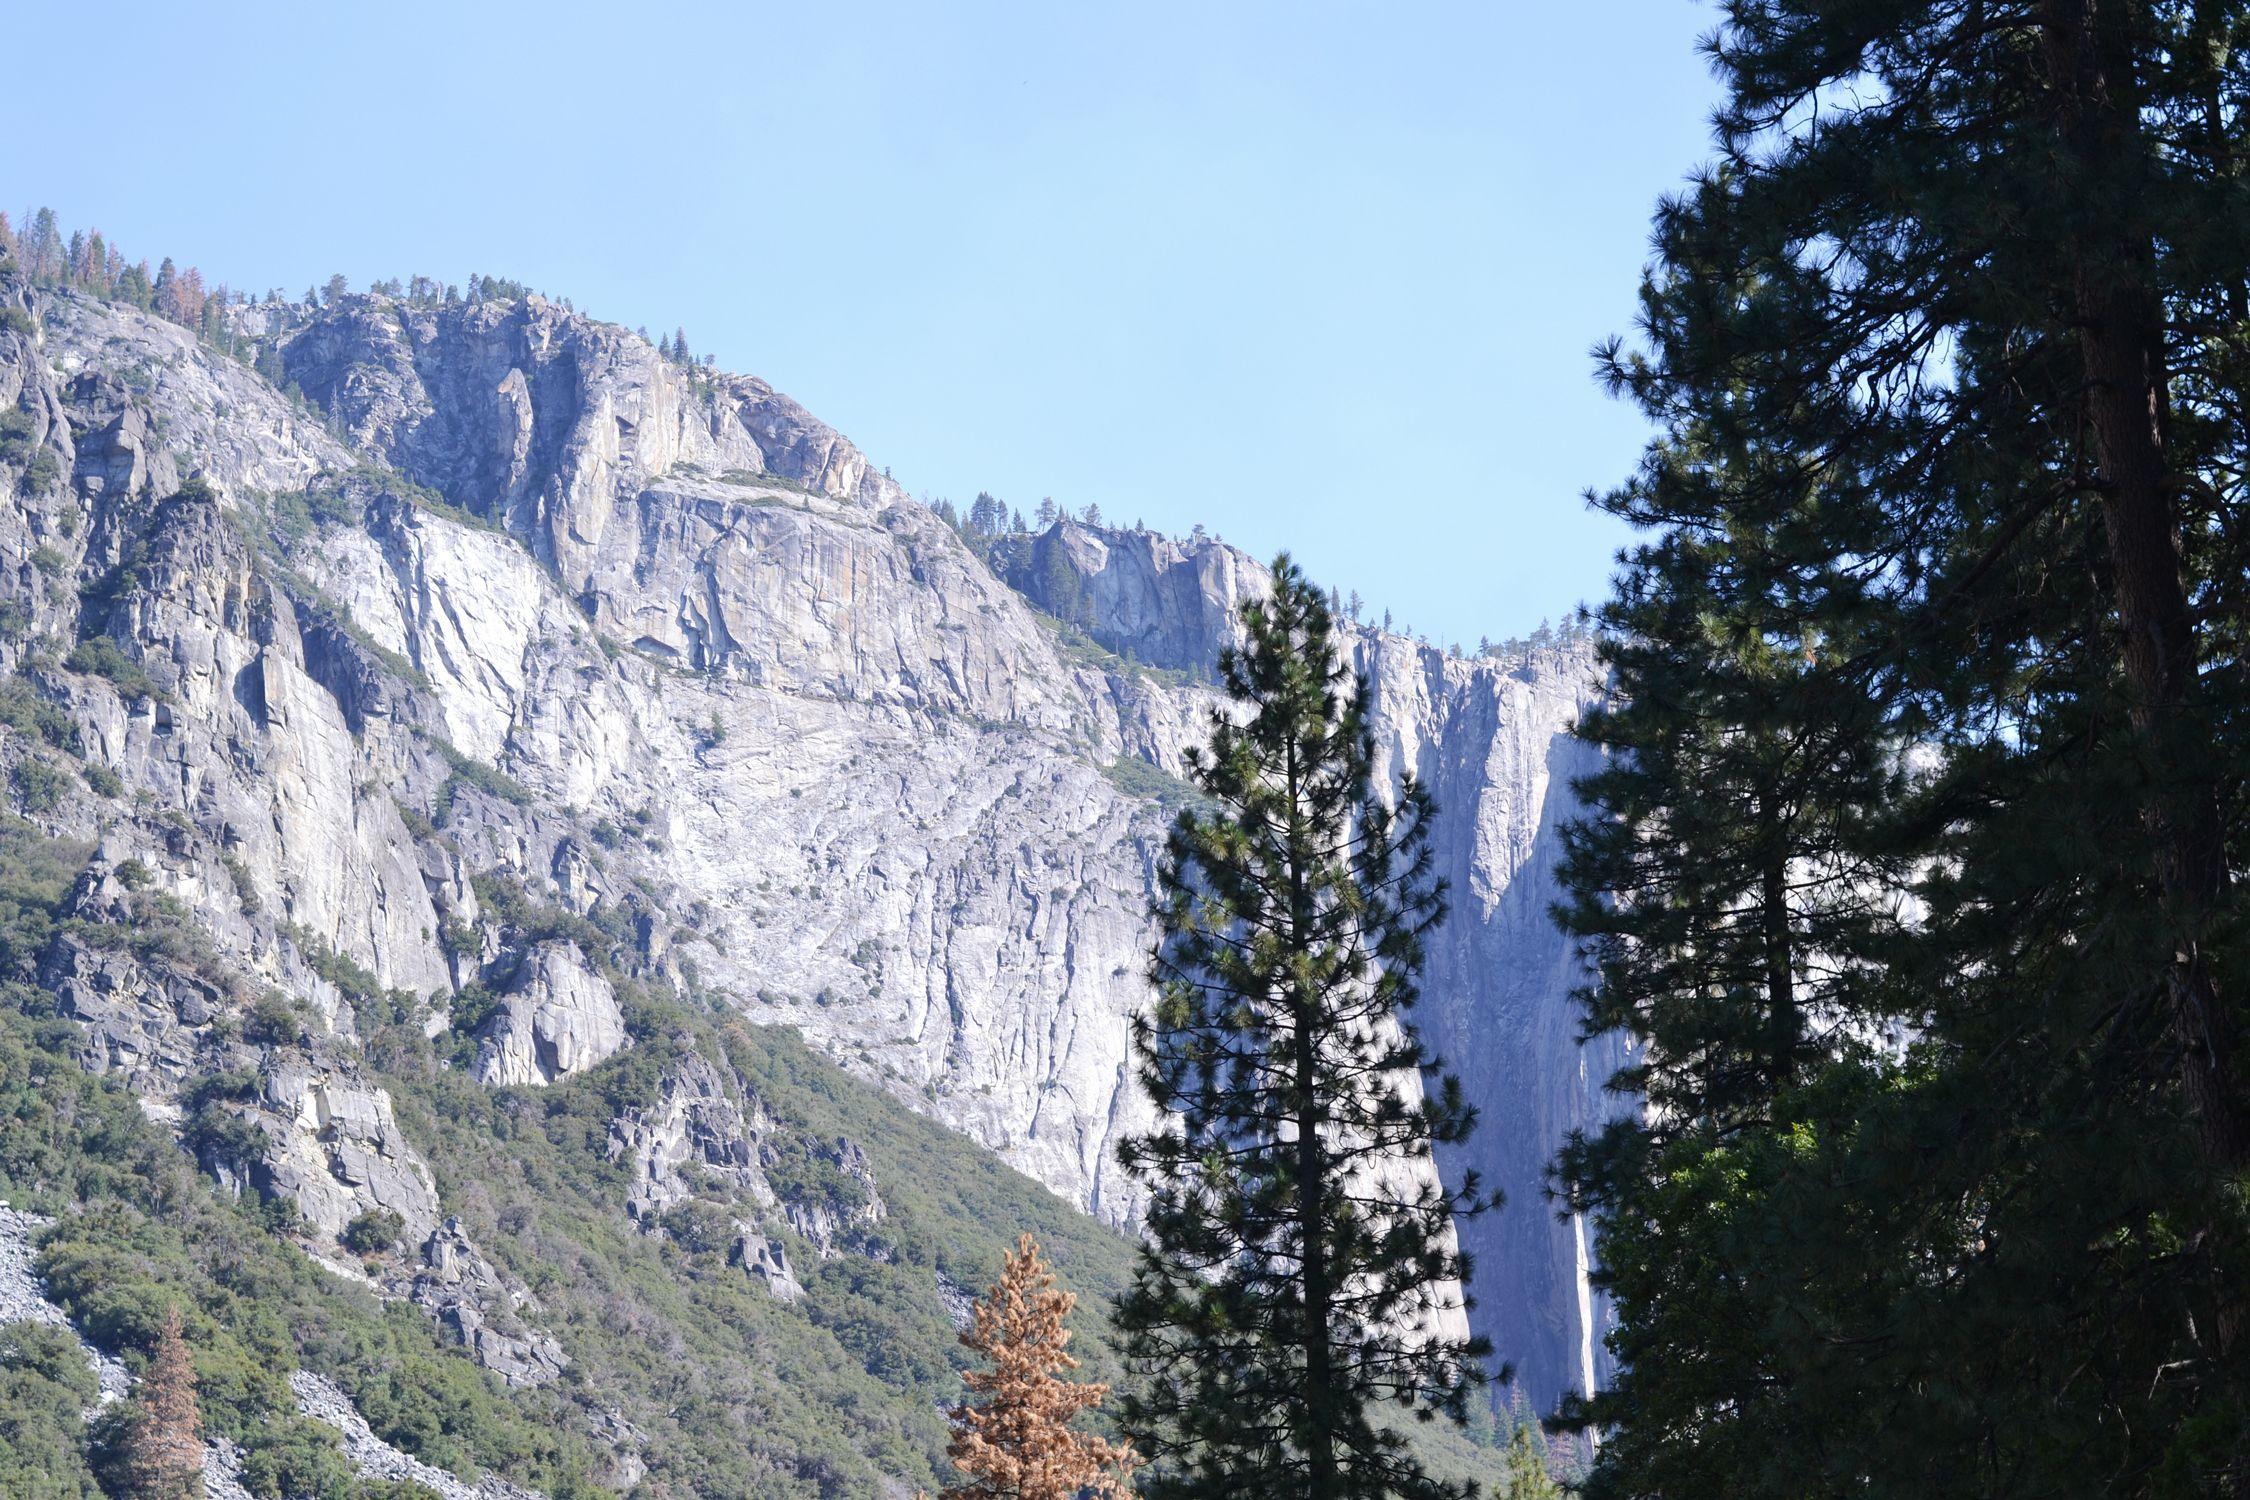 Visiter le Yosemite Park